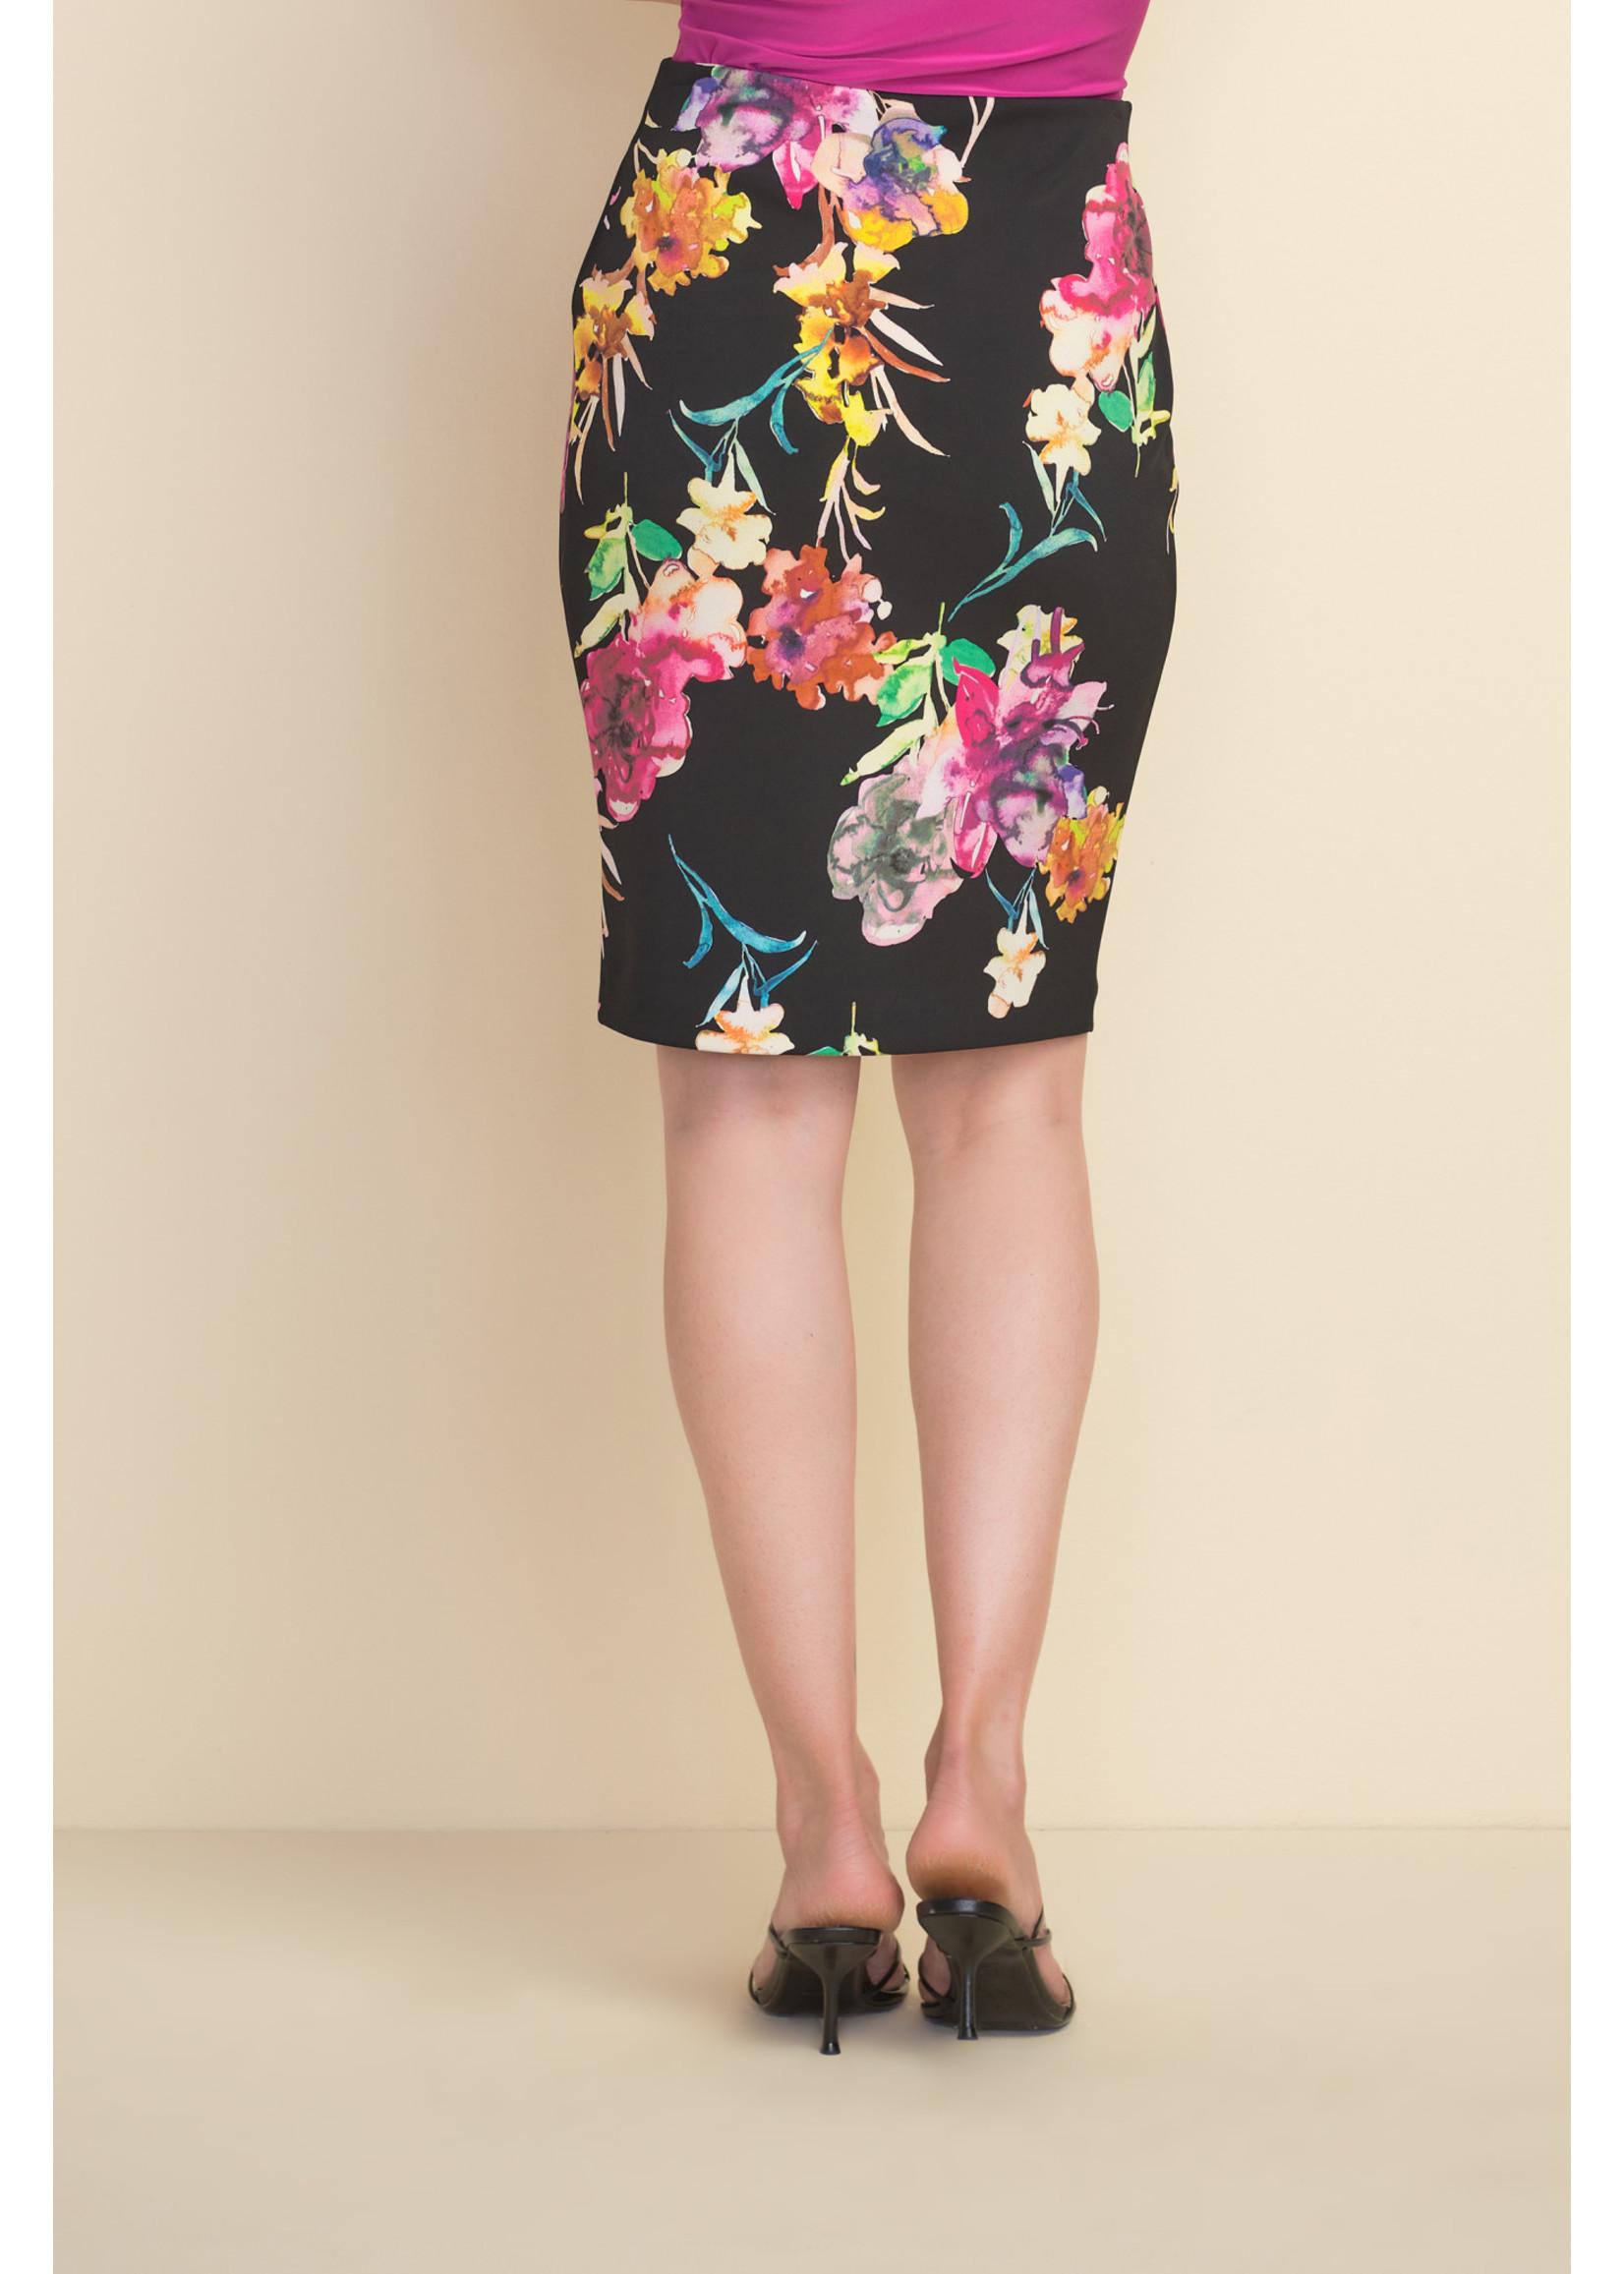 Joseph Ribkoff Floral Skirt